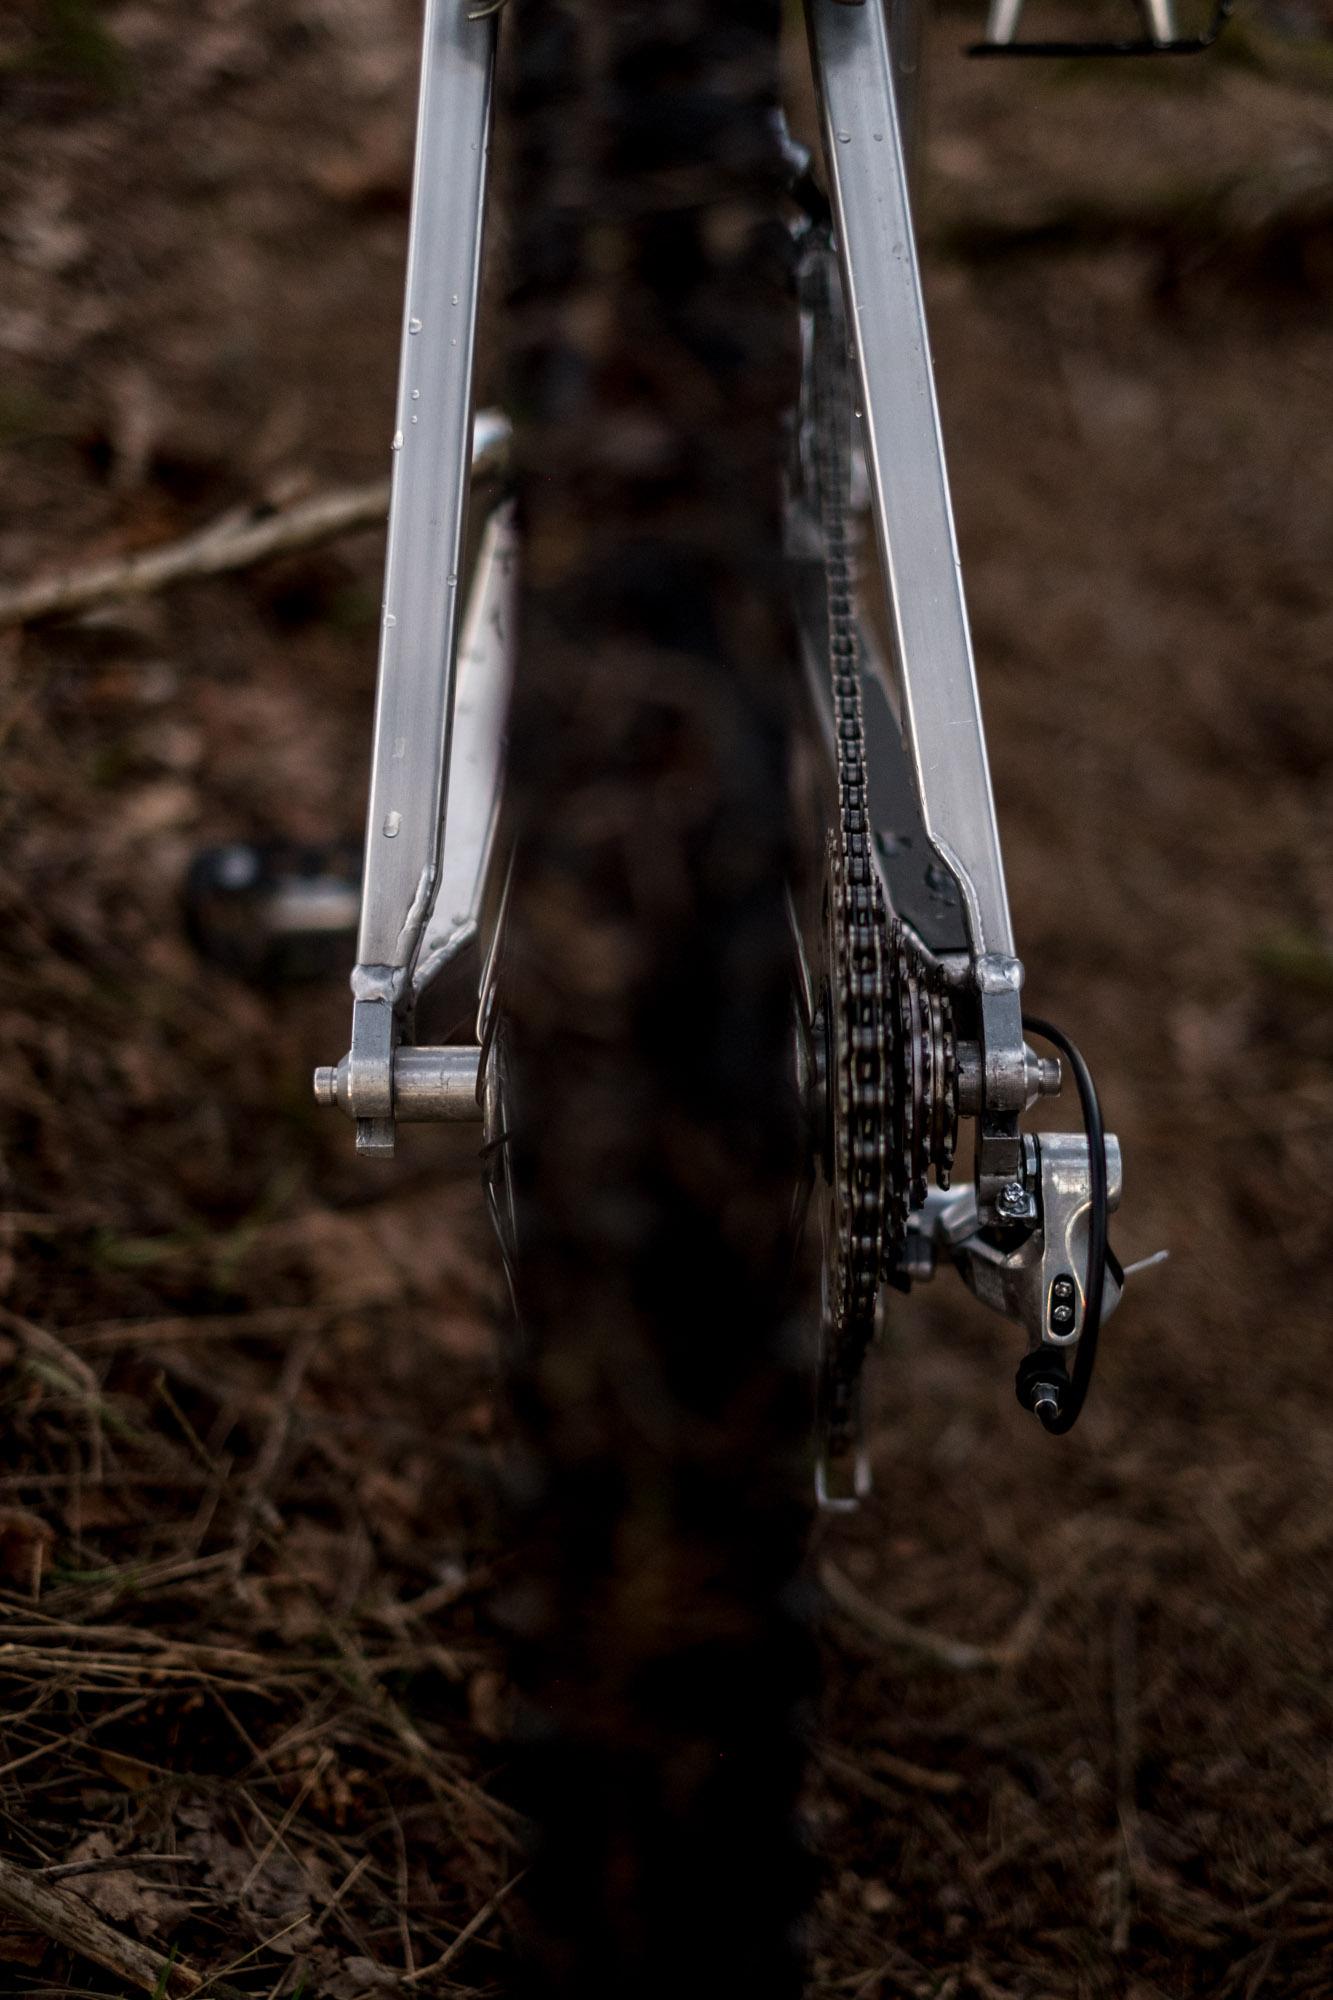 dishless wheels - 145mm rear spacing